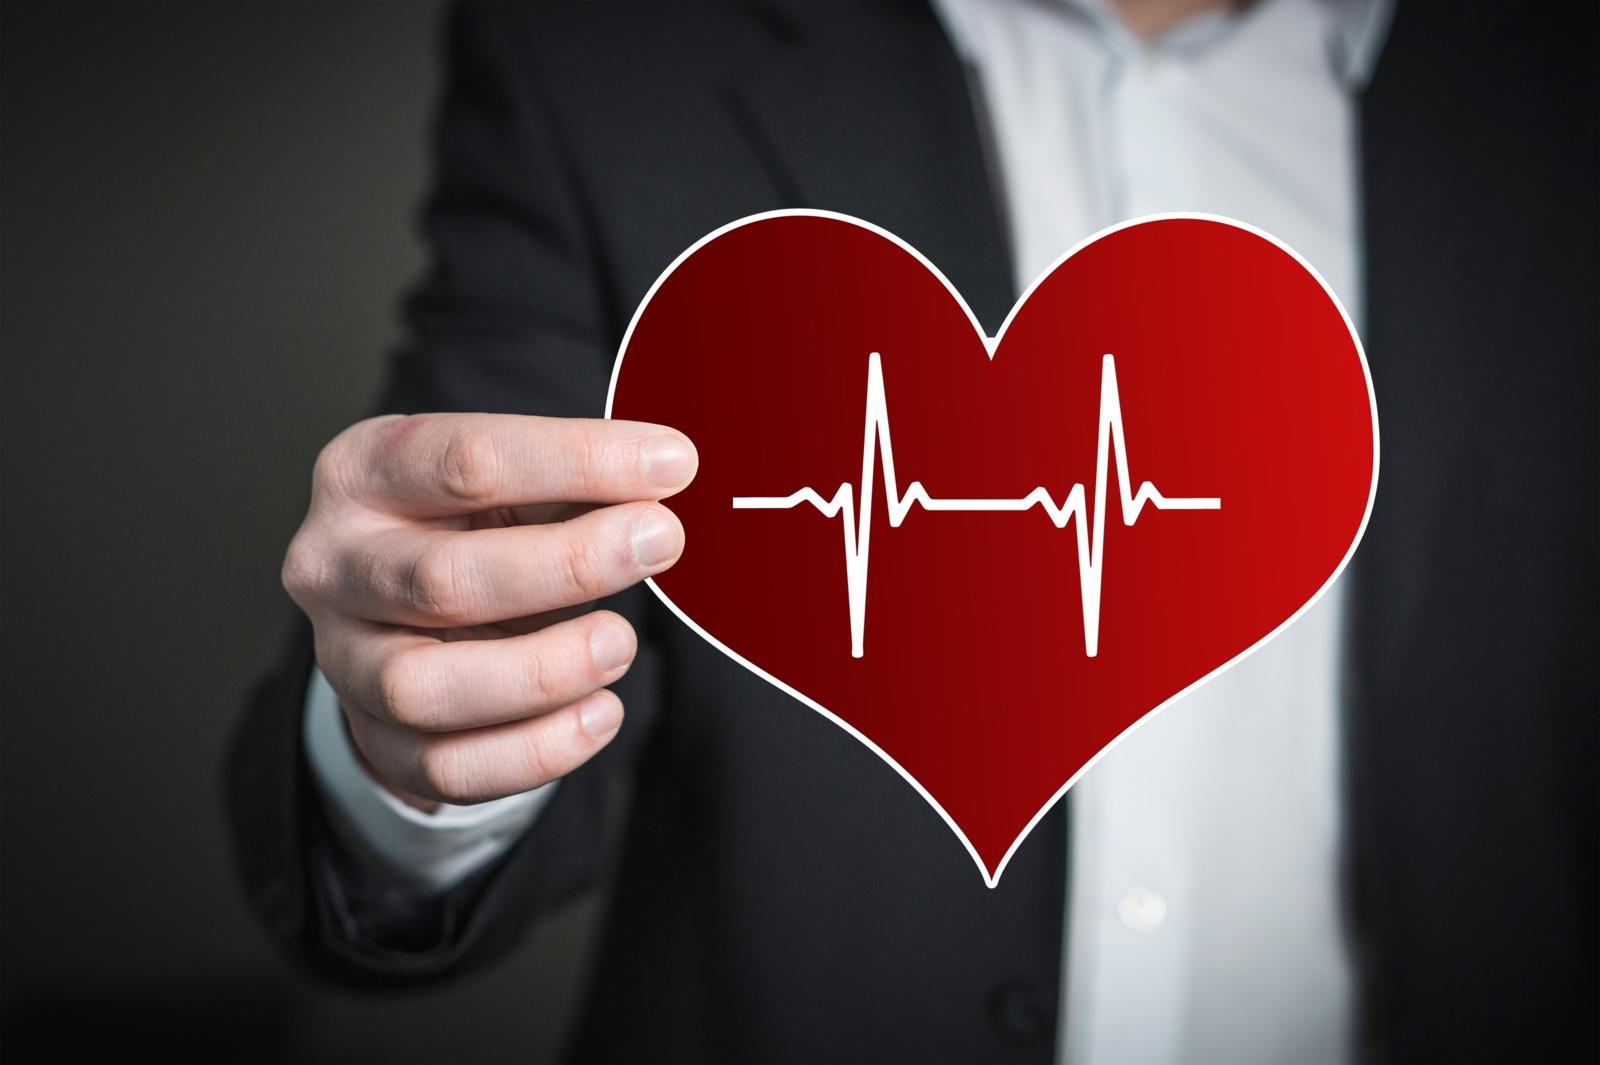 hipertenzijos testas internete)